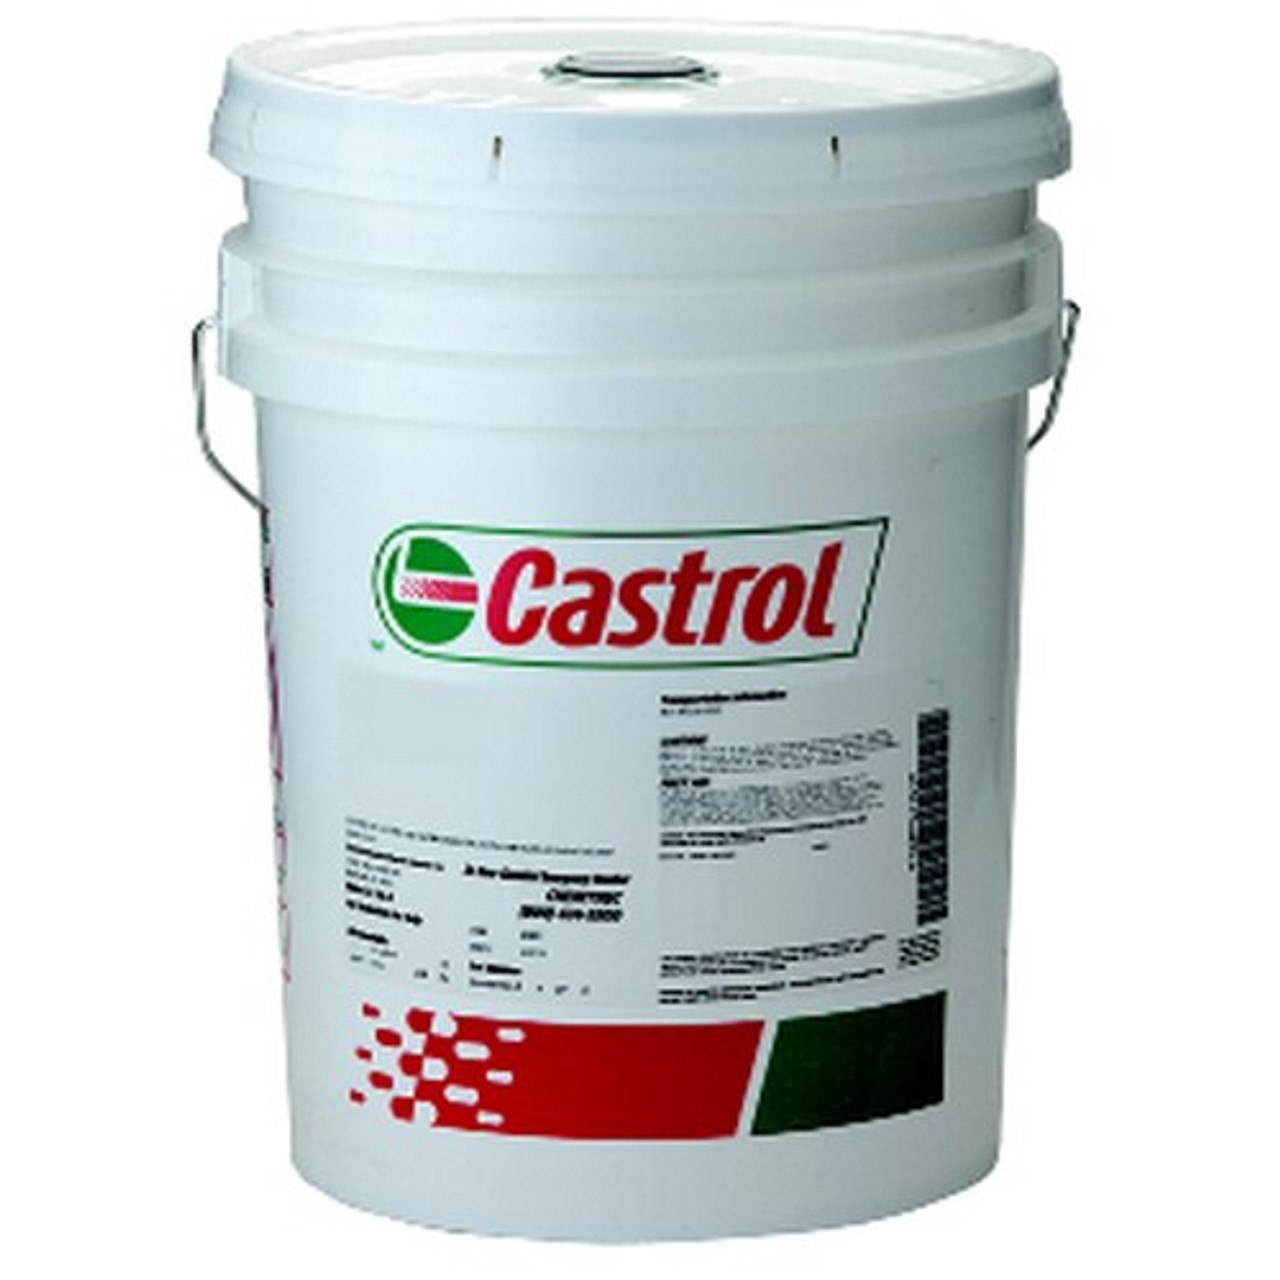 Castrol Hyspin VG 32 - 5 Gallon Pail